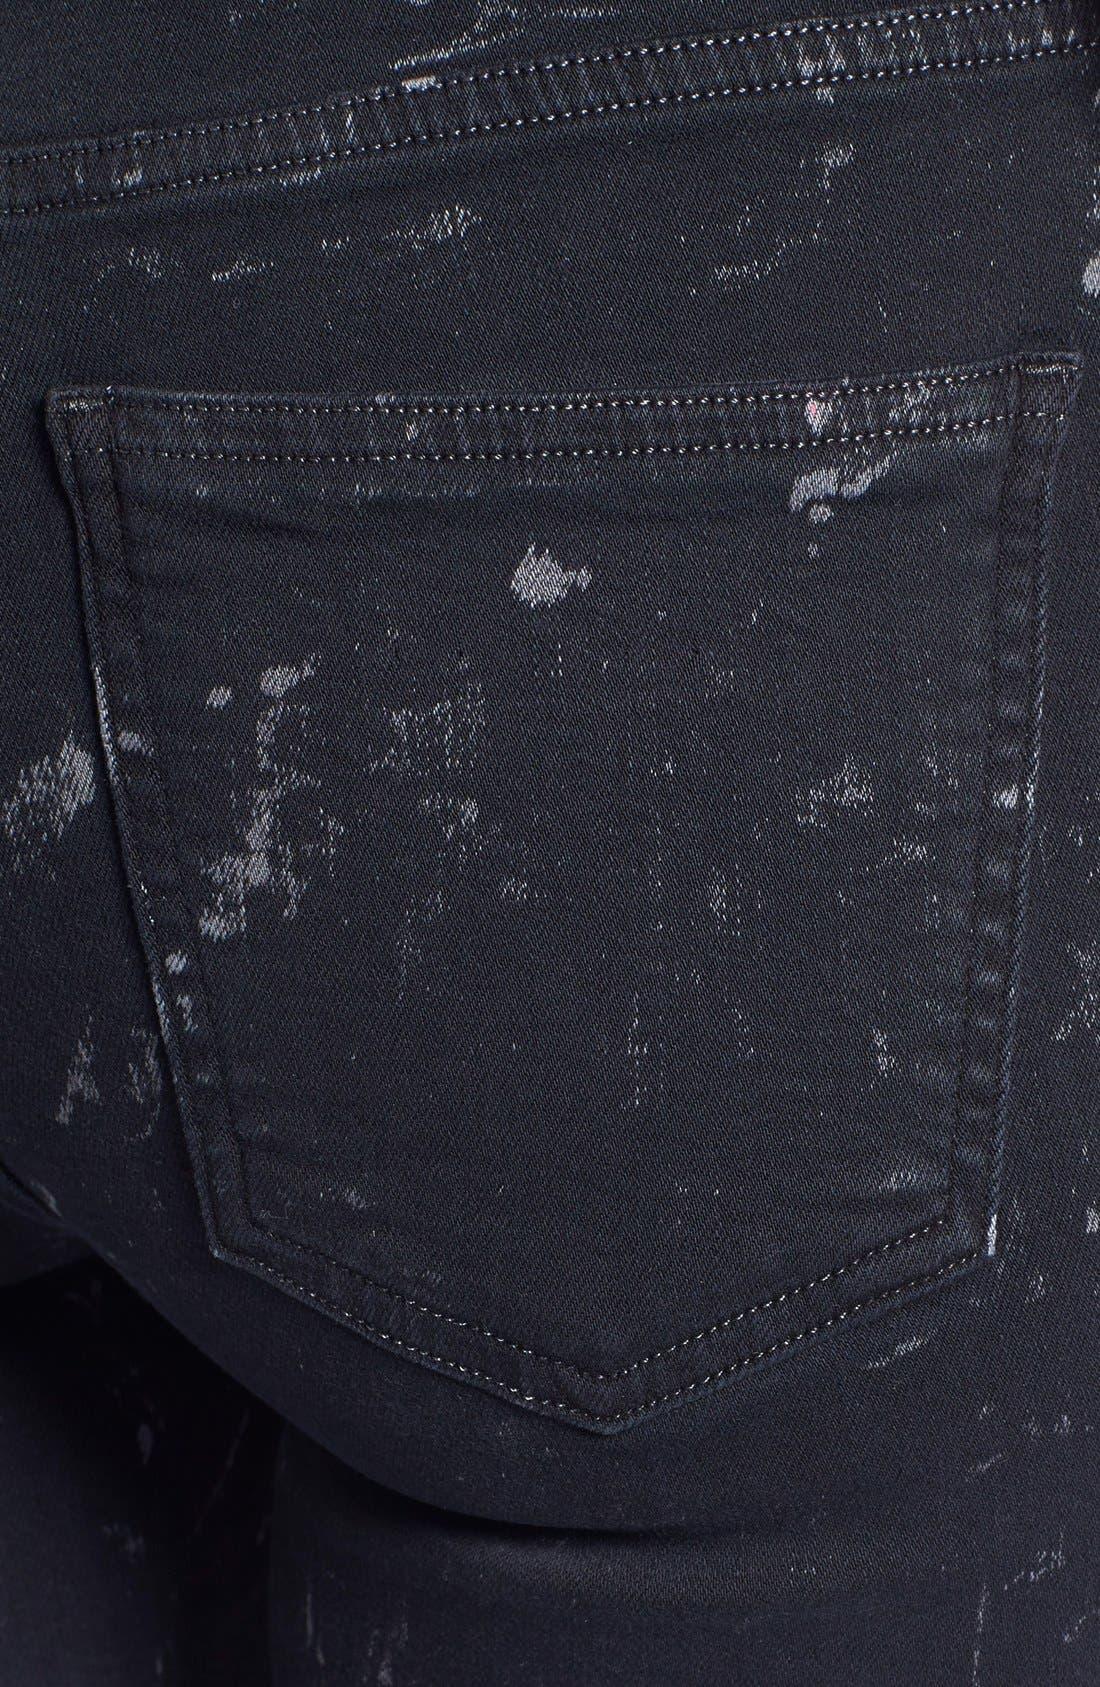 Alternate Image 3  - Citizens of Humanity 'Rocket' Skinny Jeans (Starry Black)